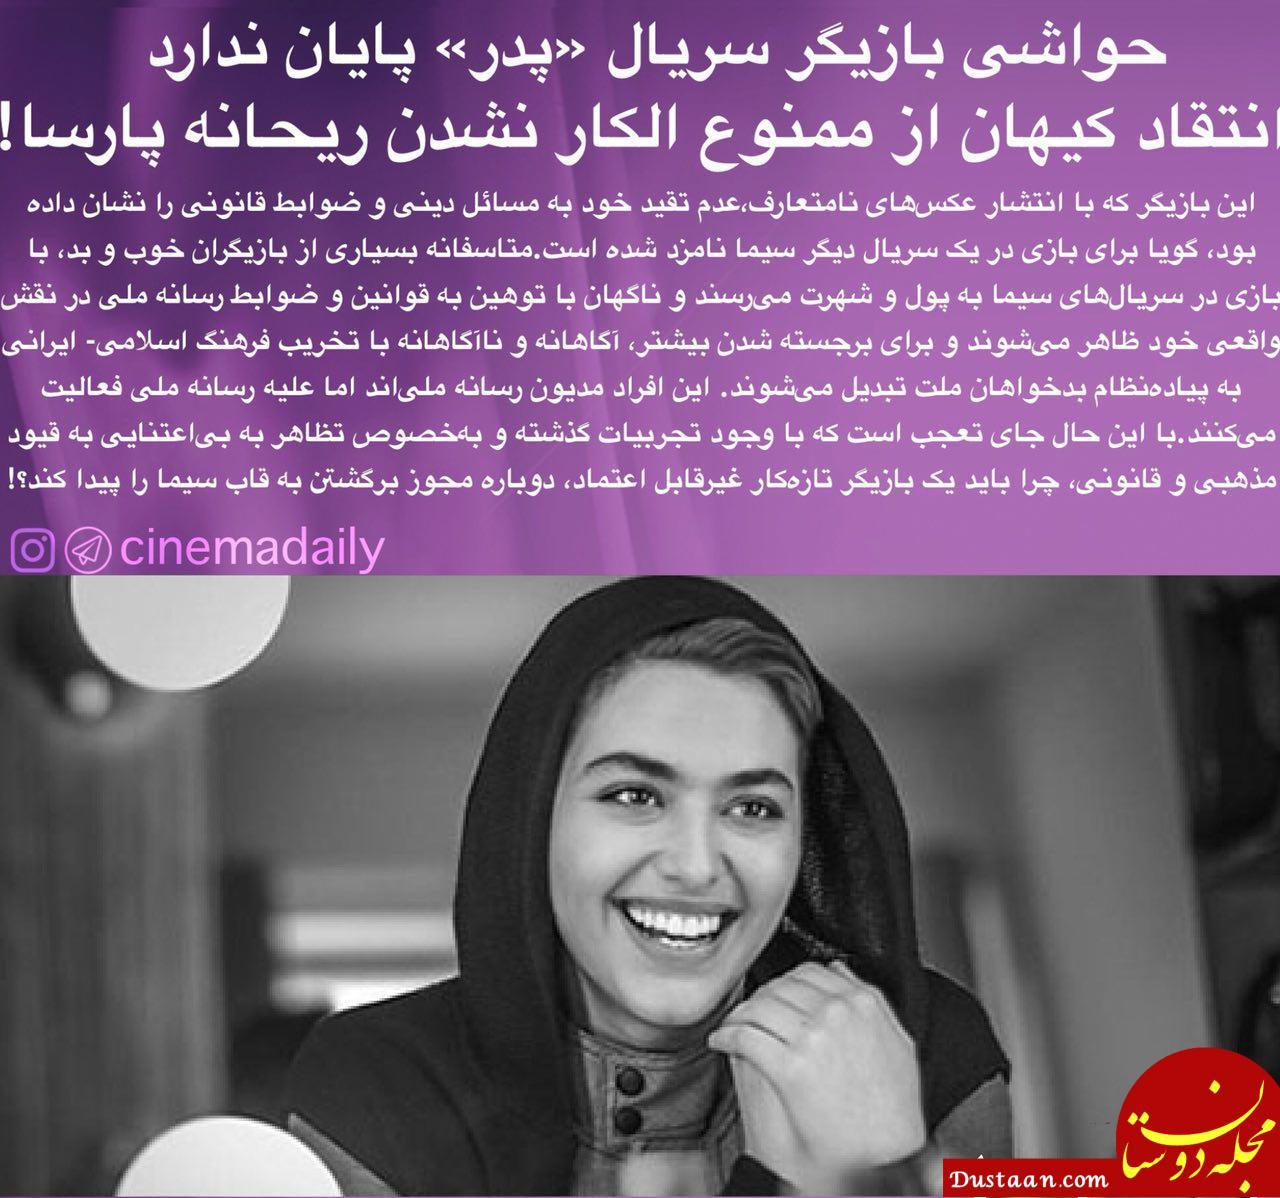 www.dustaan.com انتقاد کیهان از ممنوع الکار نشدن بازیگر سریال «پدر»